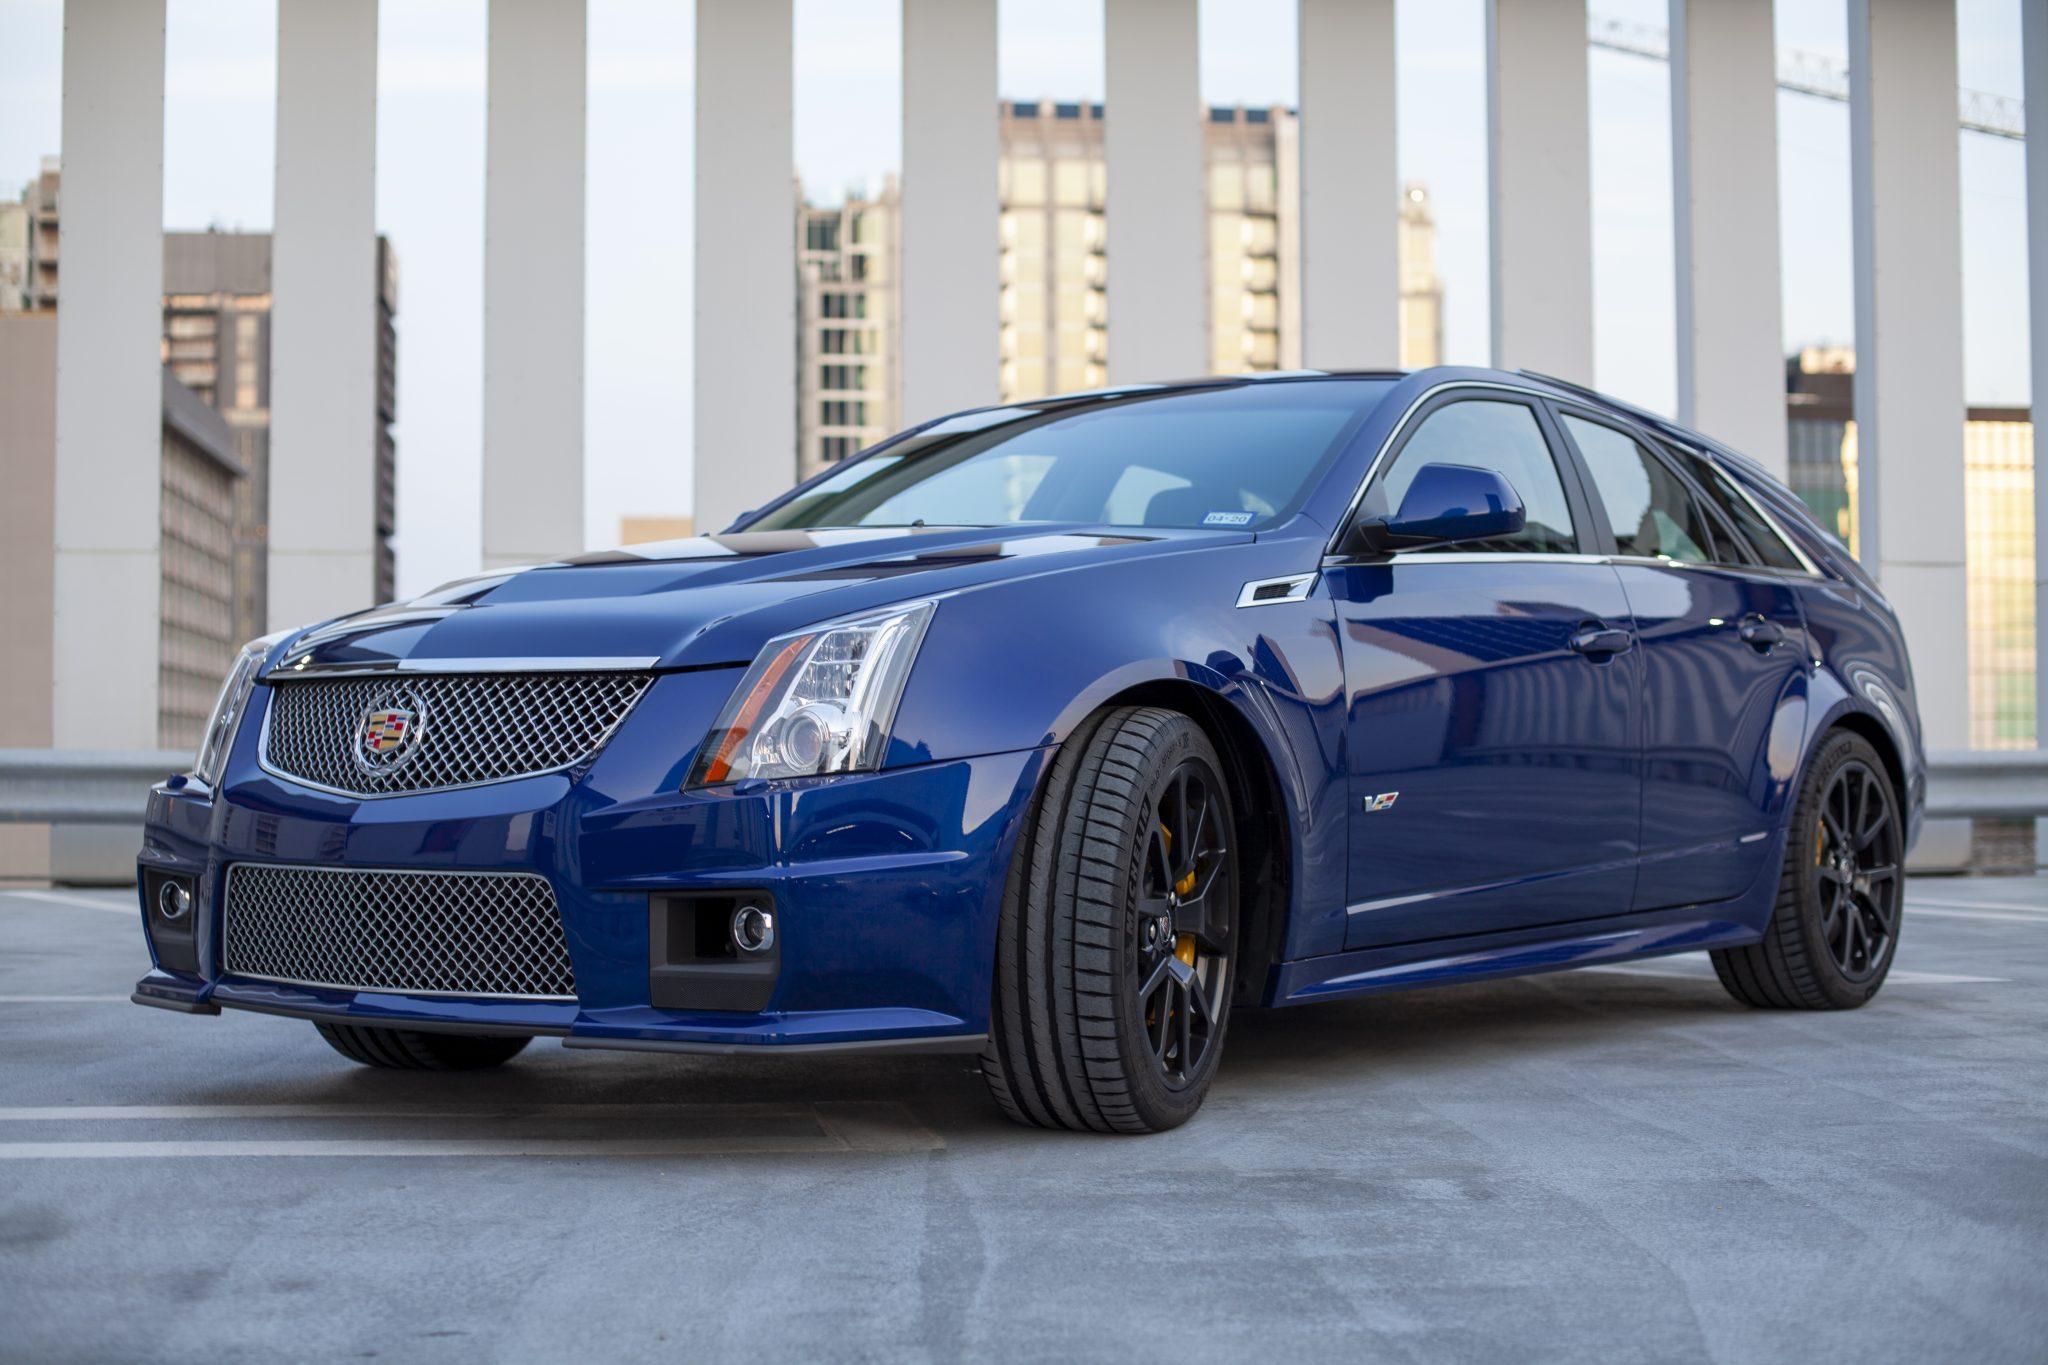 2012 Cadillac CTS-V Wagon front three-quarter